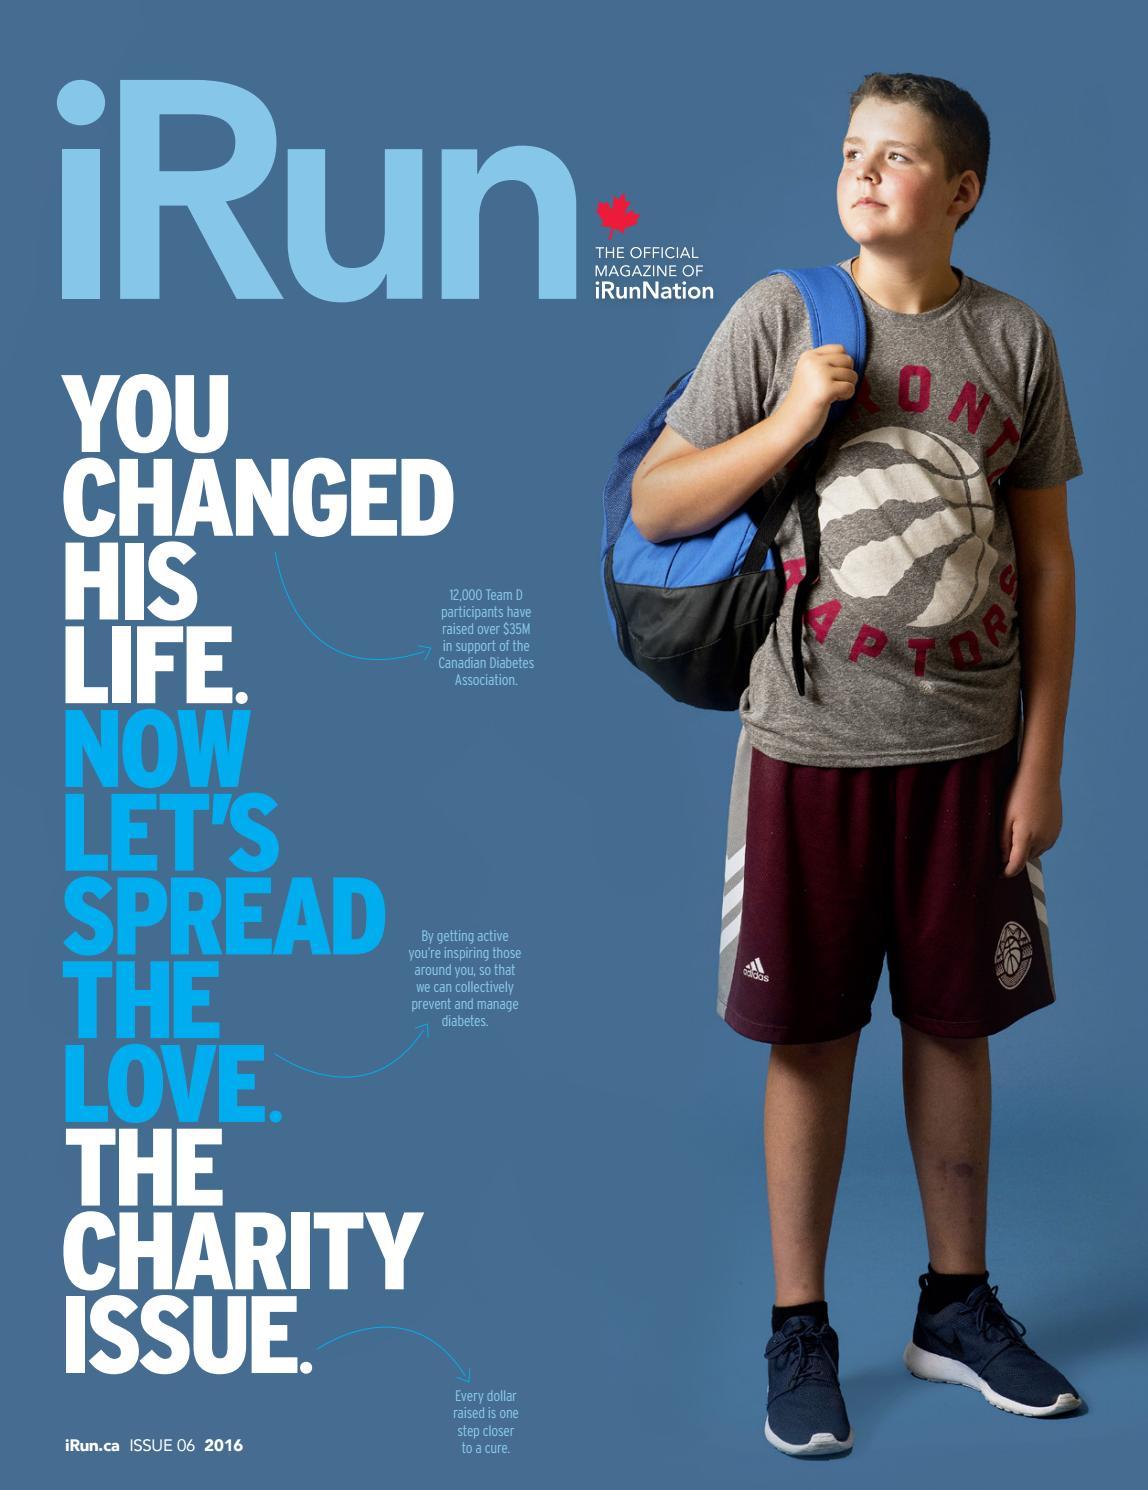 iRun ISSUE06 2016 by iRun magazine - issuu a916aa7b1adb